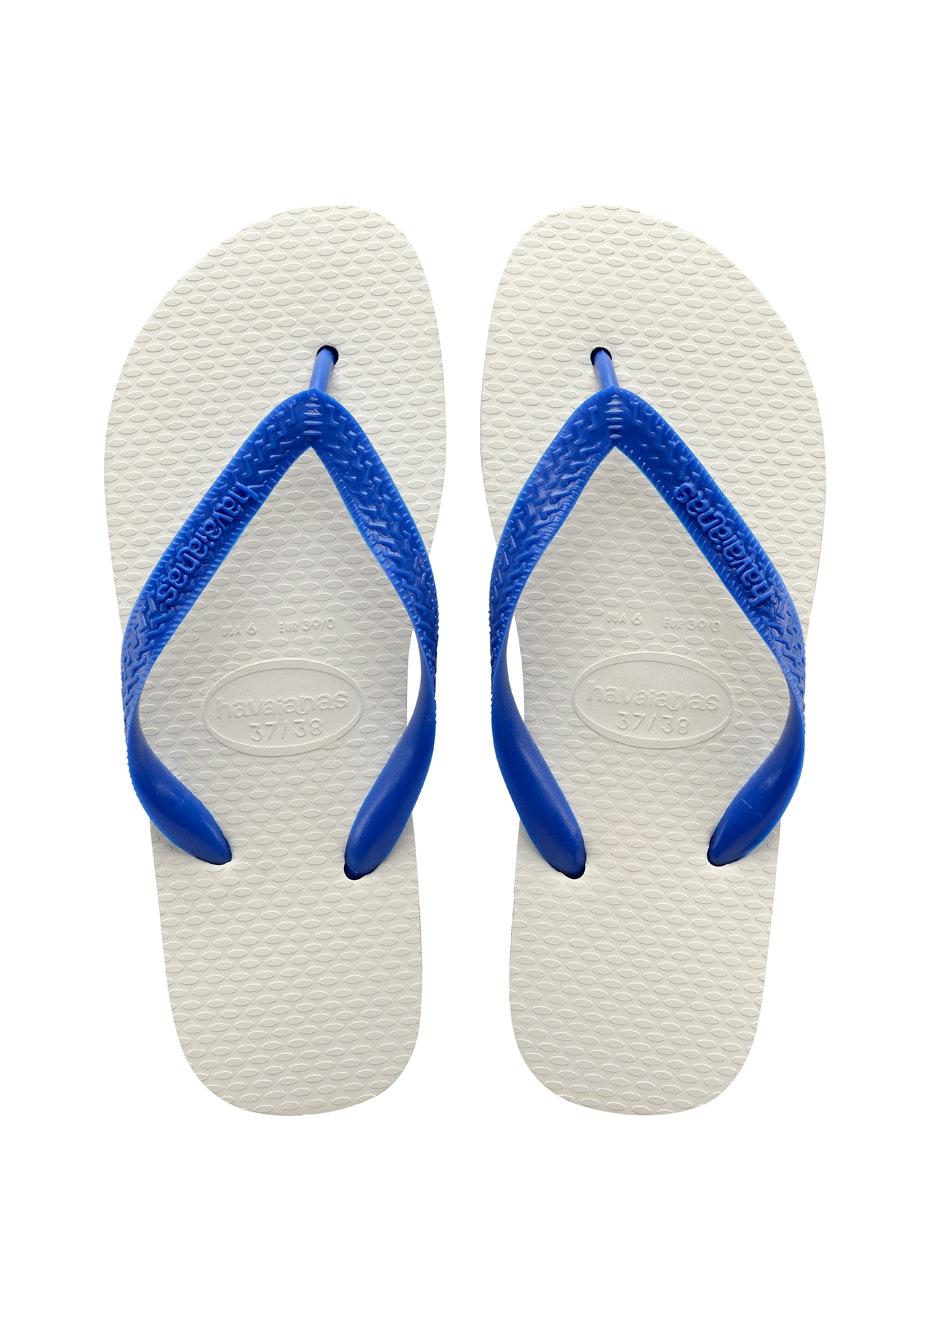 Havaianas Mens - Tradicional 2711 - Marine Blue